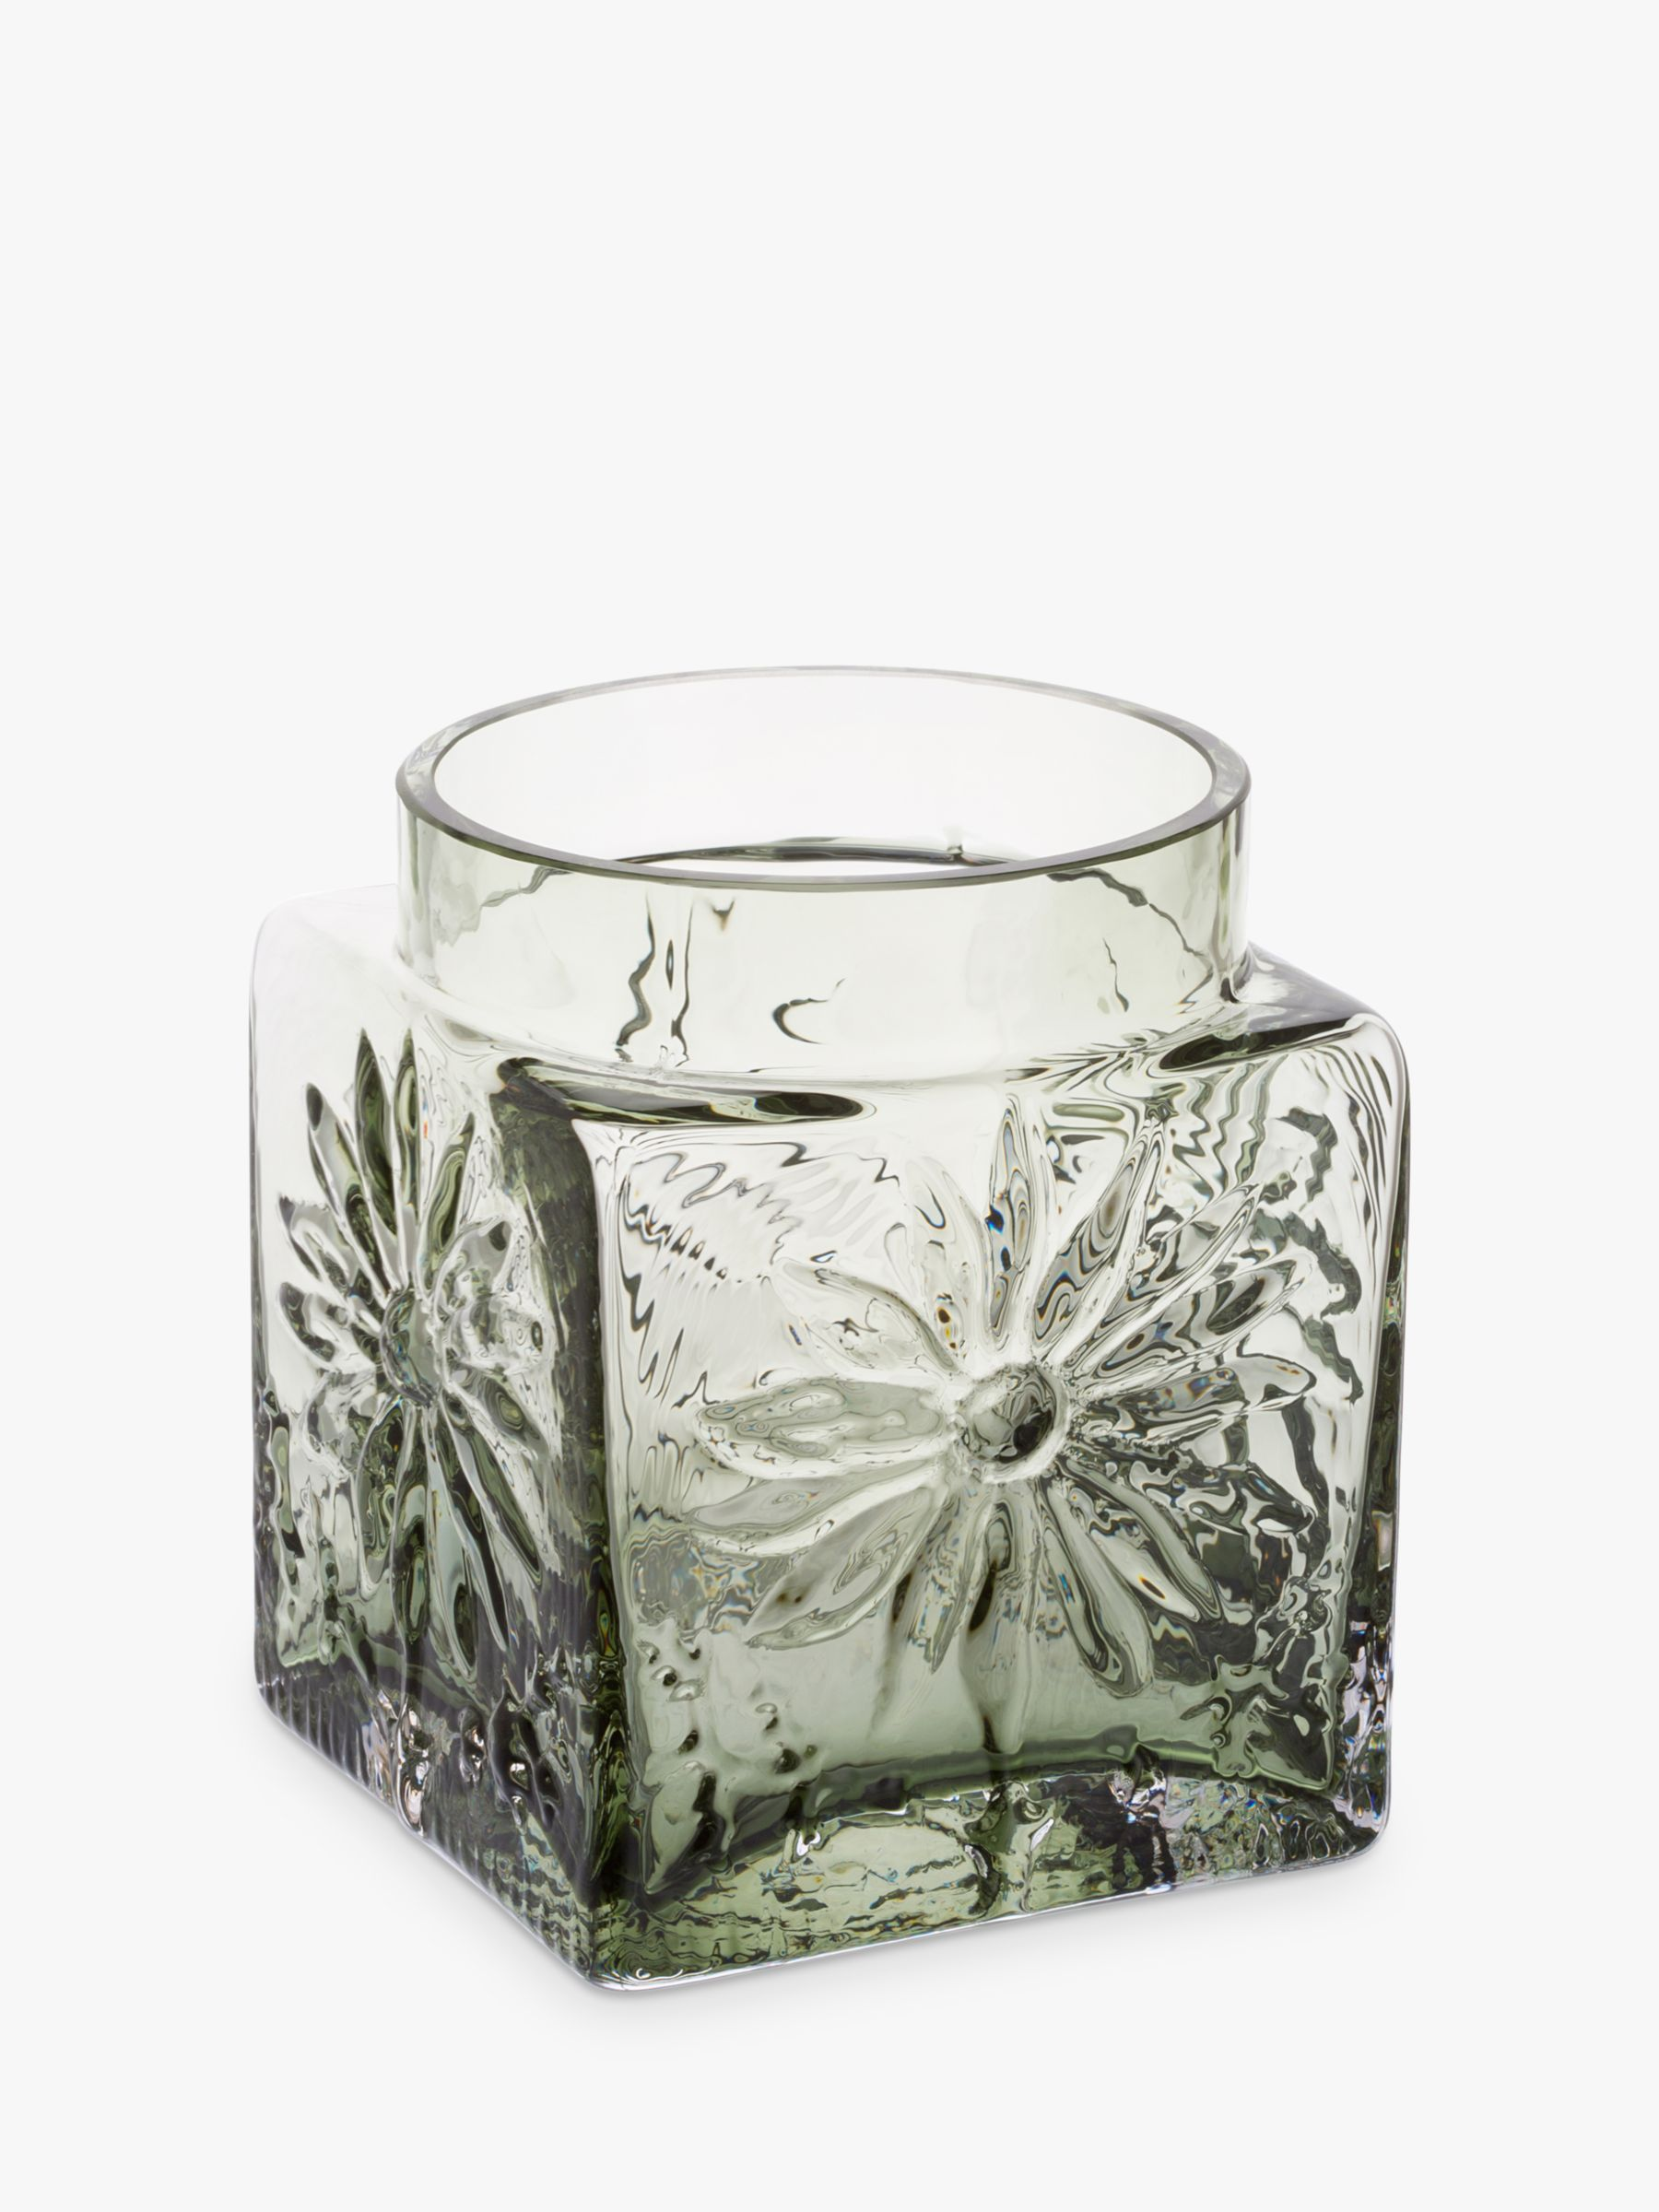 Dartington Crystal Dartington Crystal Marguerite Square Vase, Olive, H12cm